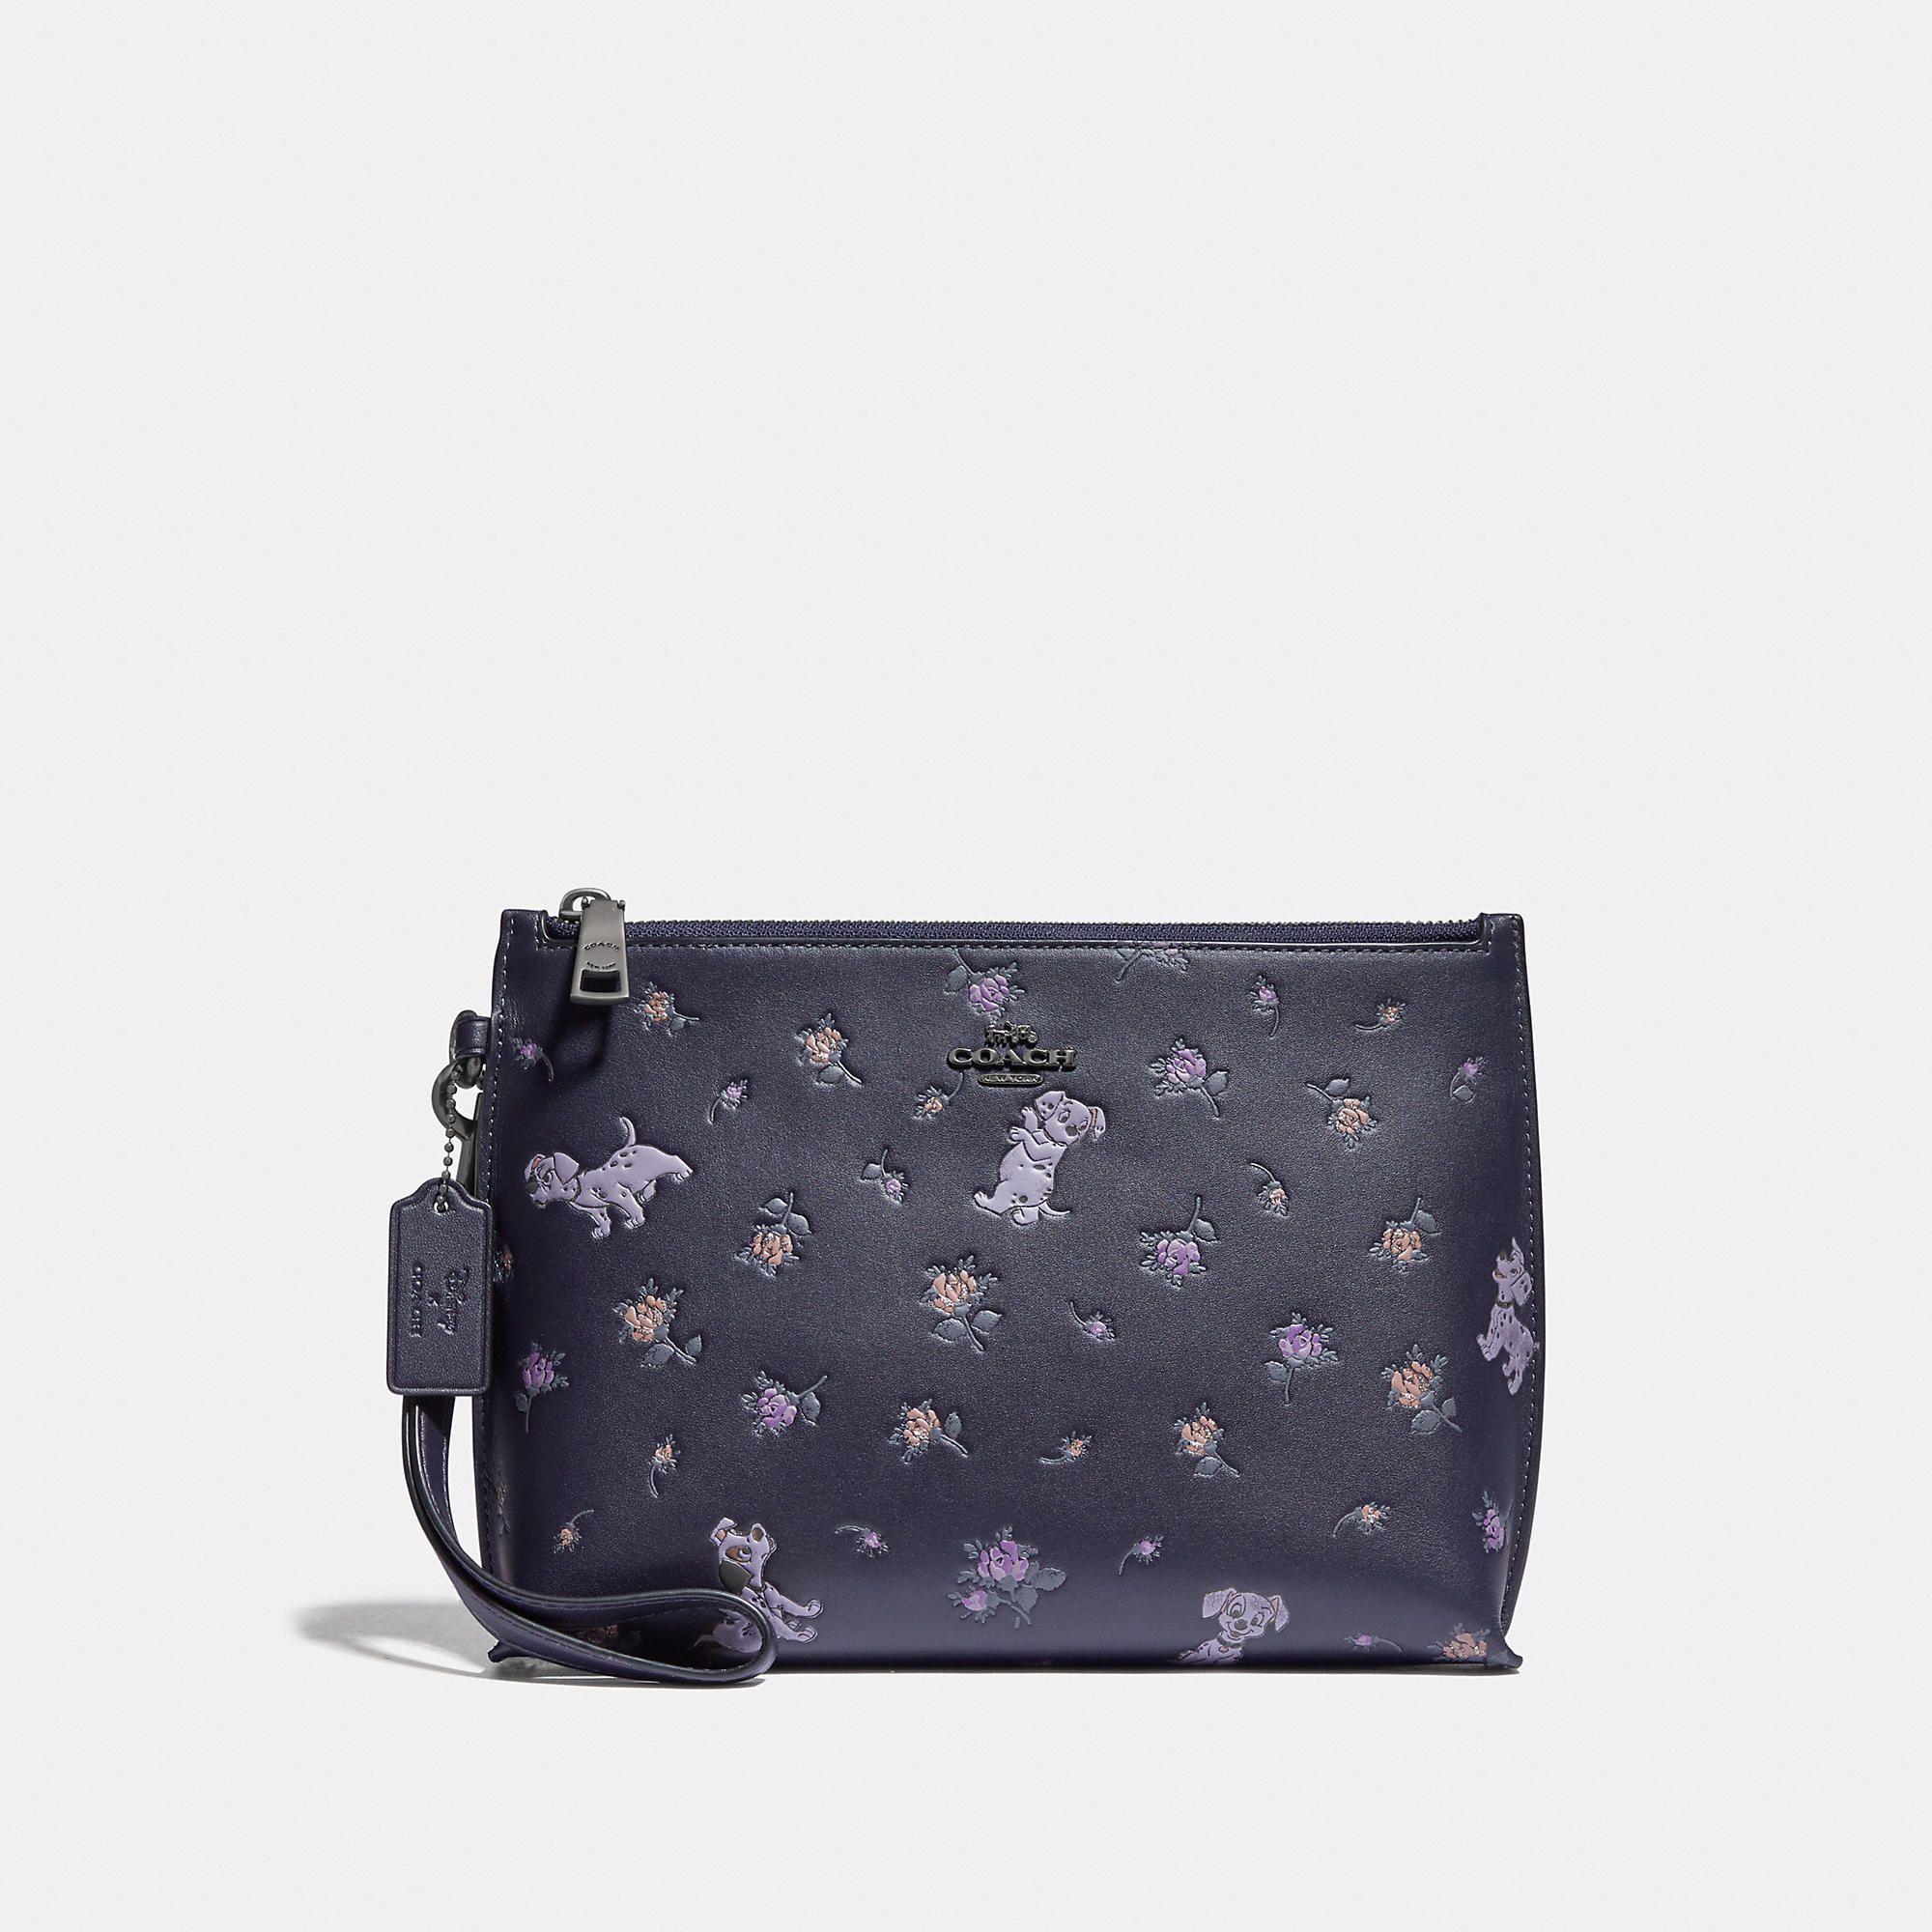 Coach Official Site Designer Handbags Wallets Clothing Menswear Shoes More Pouch Coach Disney Coach